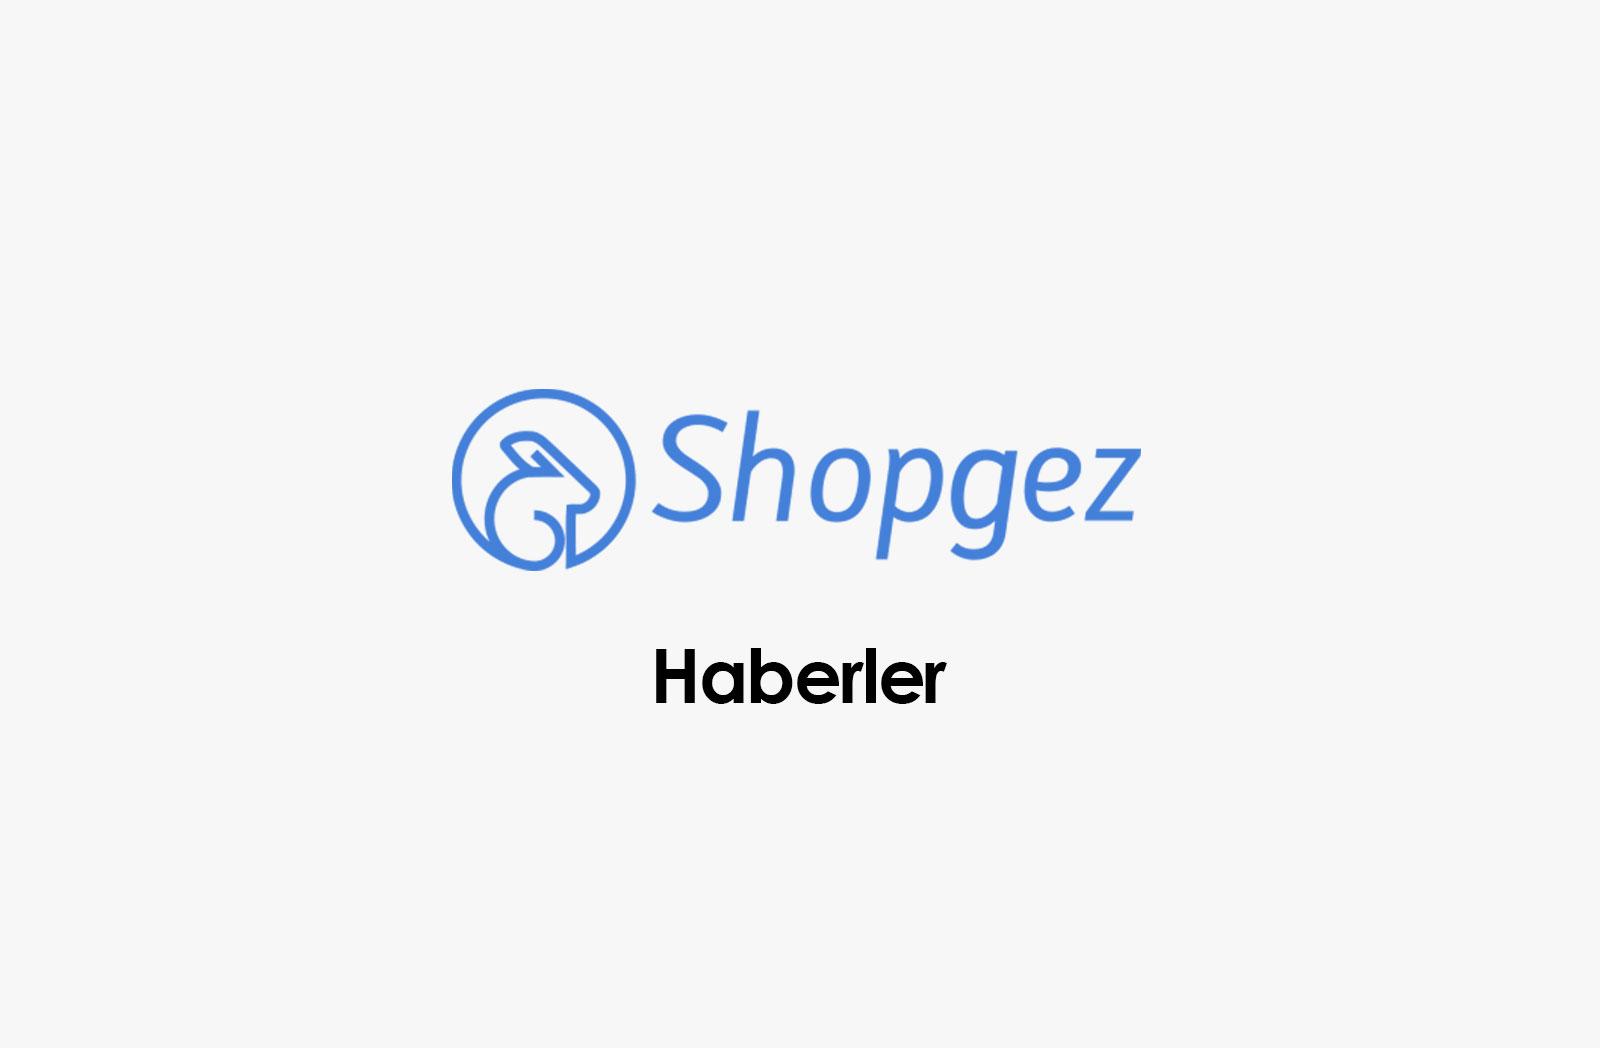 shopgez-haberler-indirim